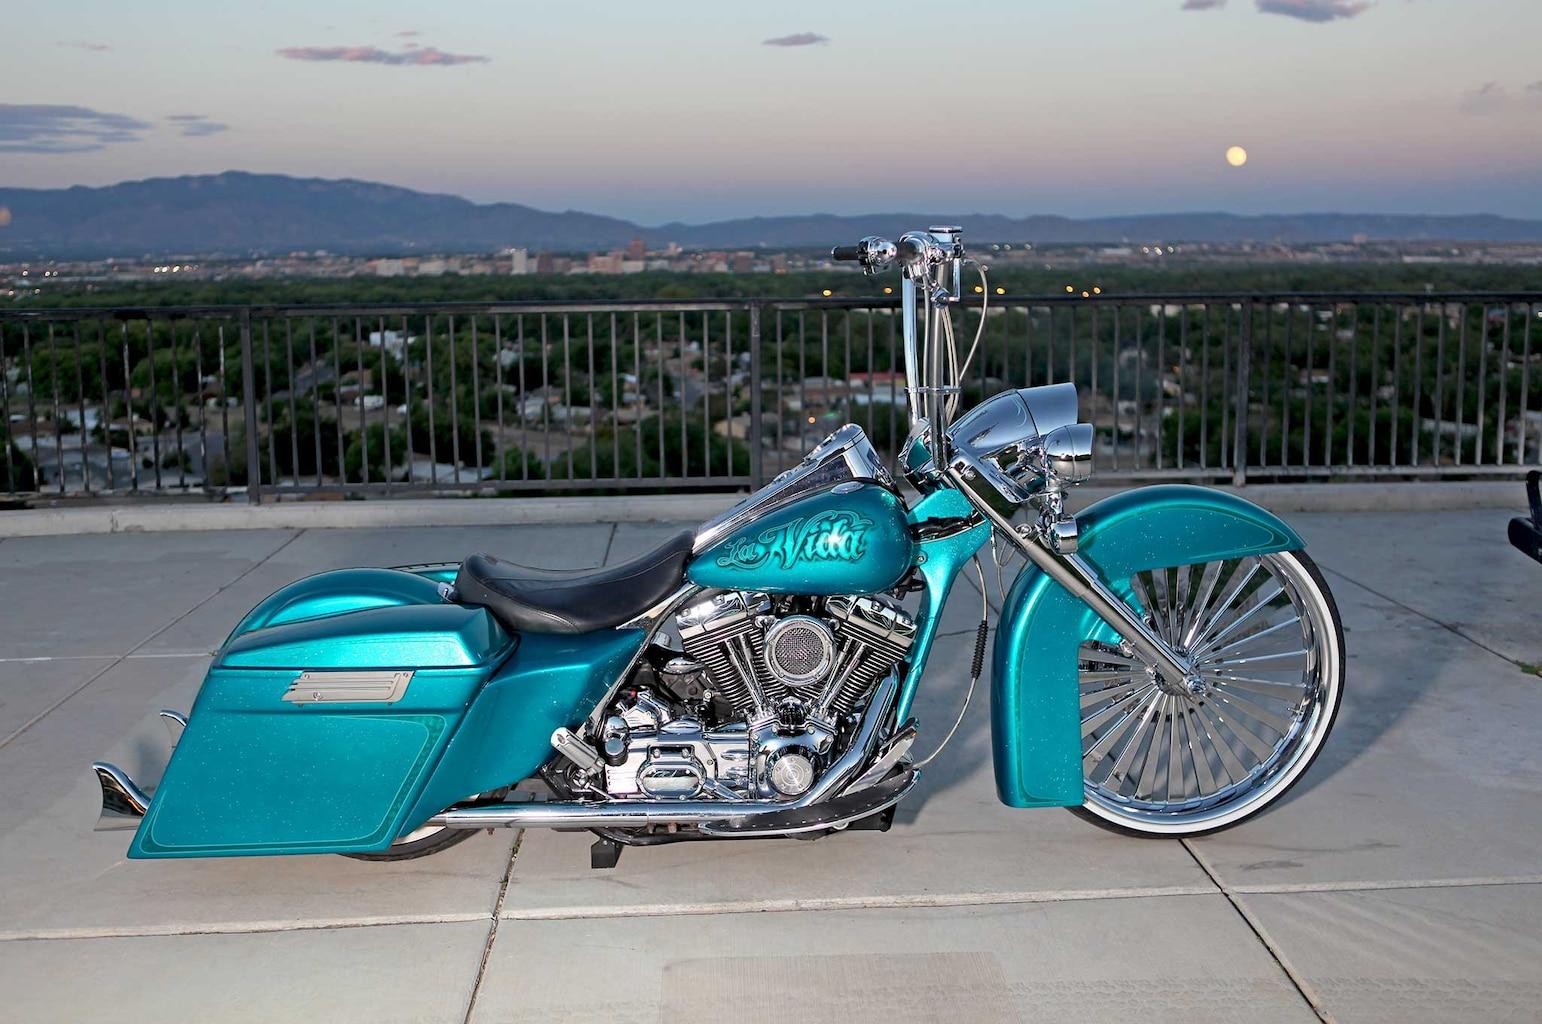 St Jerome Chrysler >> 2004 Harley Davidson Road King - King of the Road - Lowrider